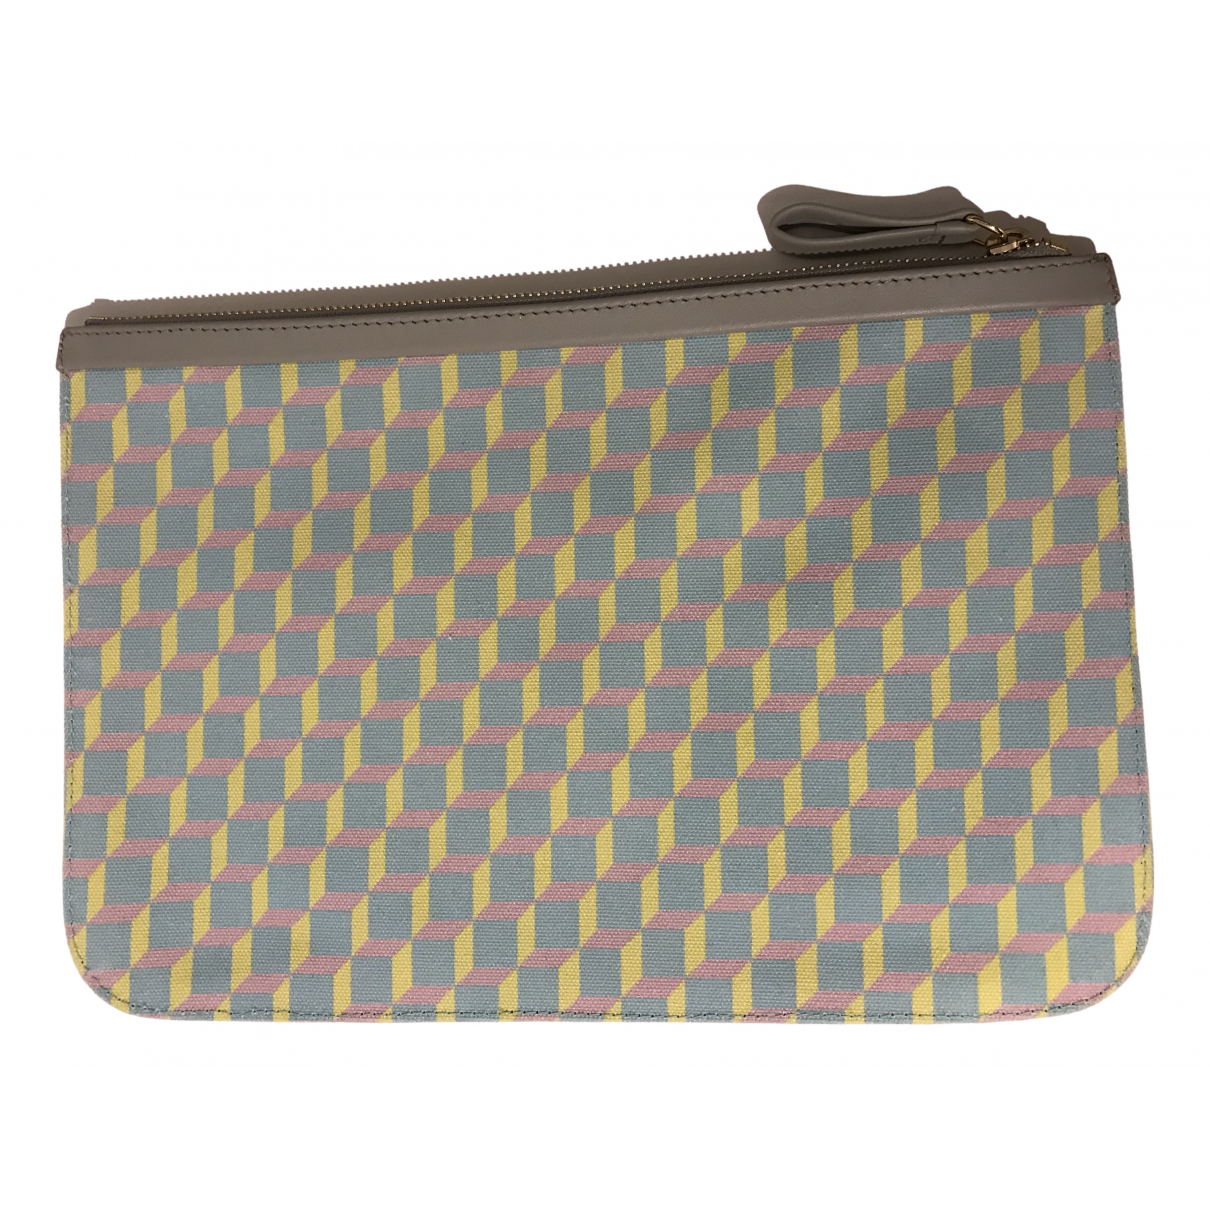 Pierre Hardy \N Multicolour Cotton Clutch bag for Women \N